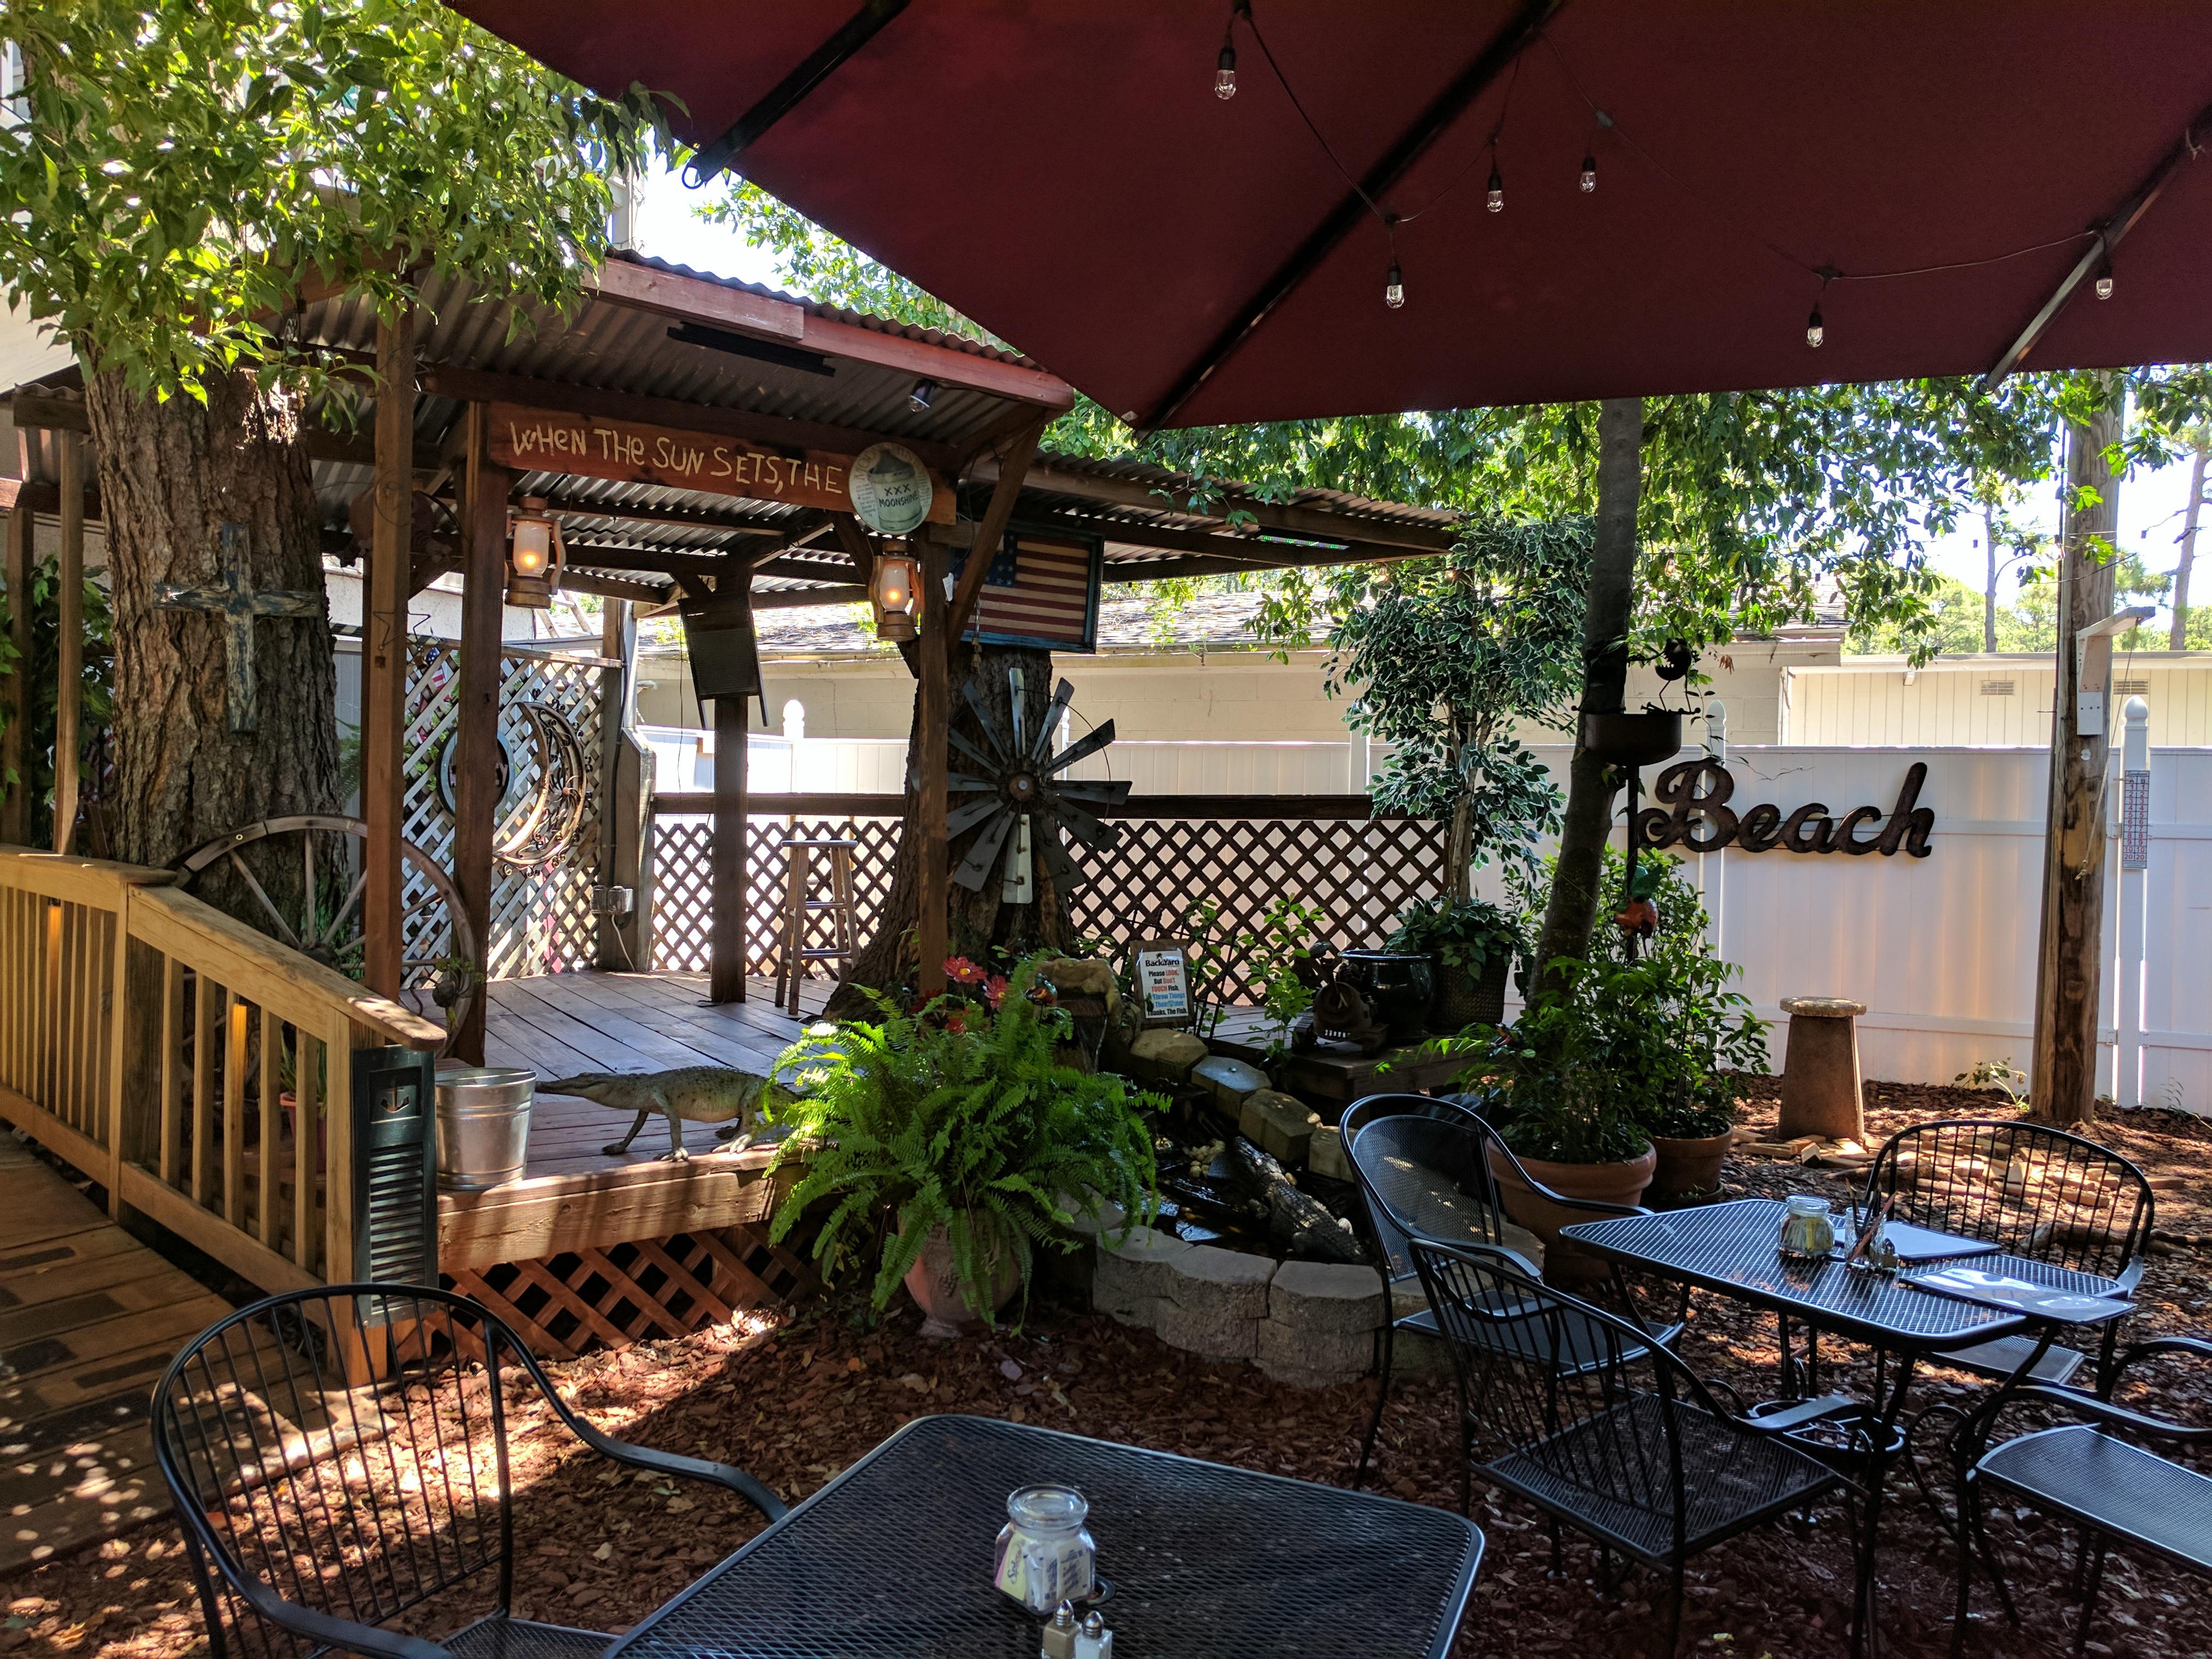 Lowcountry Backyard | Backyard Ideas